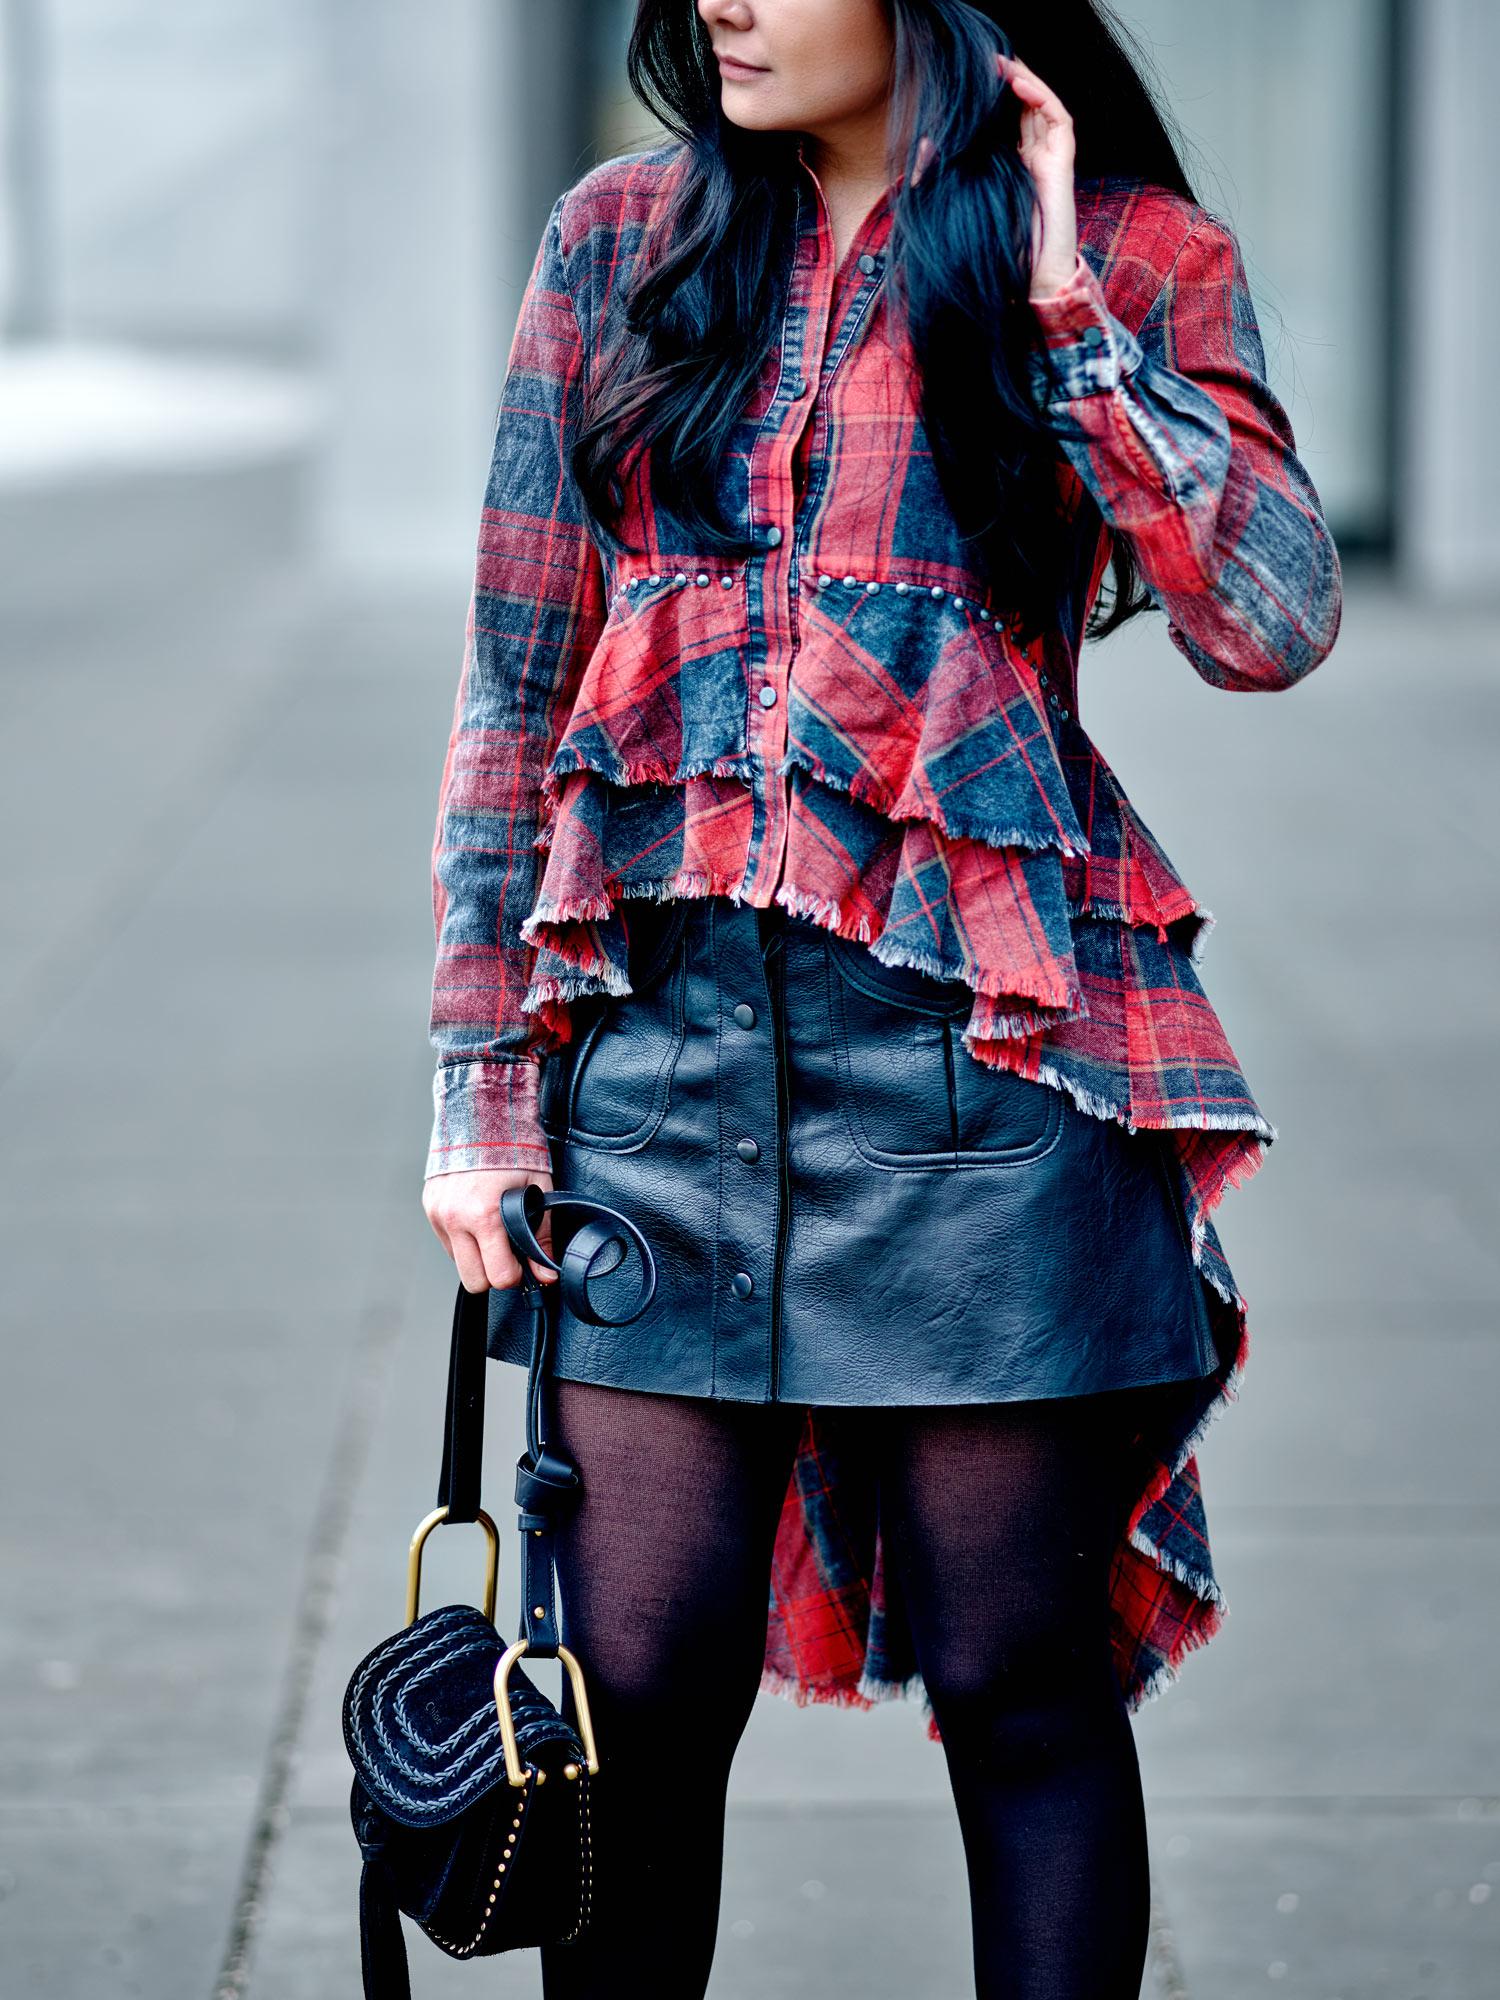 fashionambit-fashionblog-muenchen-modeblog-deutschland-blogger-modeblogger-fashionblogger-bloggerdeutschland-lifestyleblog-munich-style-blog-Valentinstag-outfit